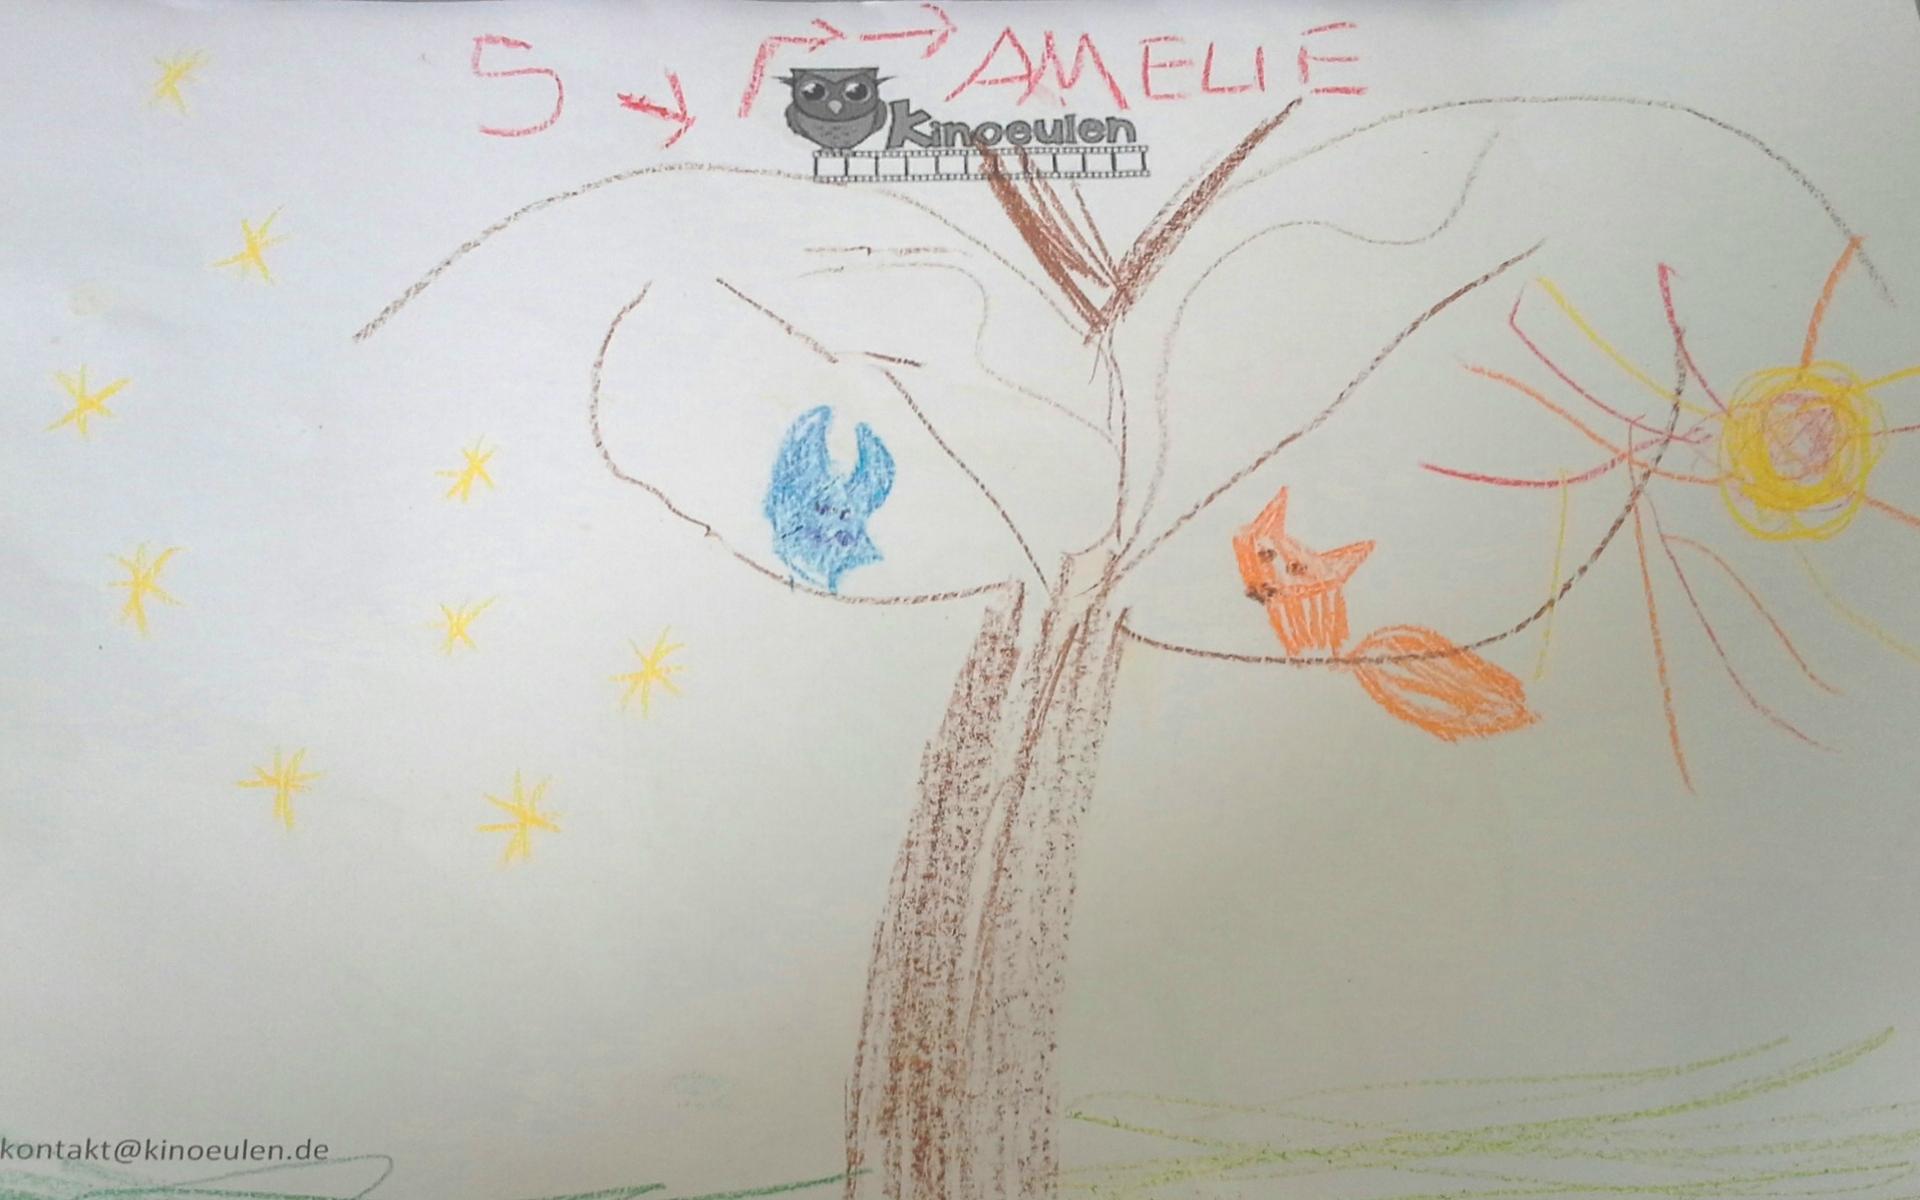 Amelie_5.2